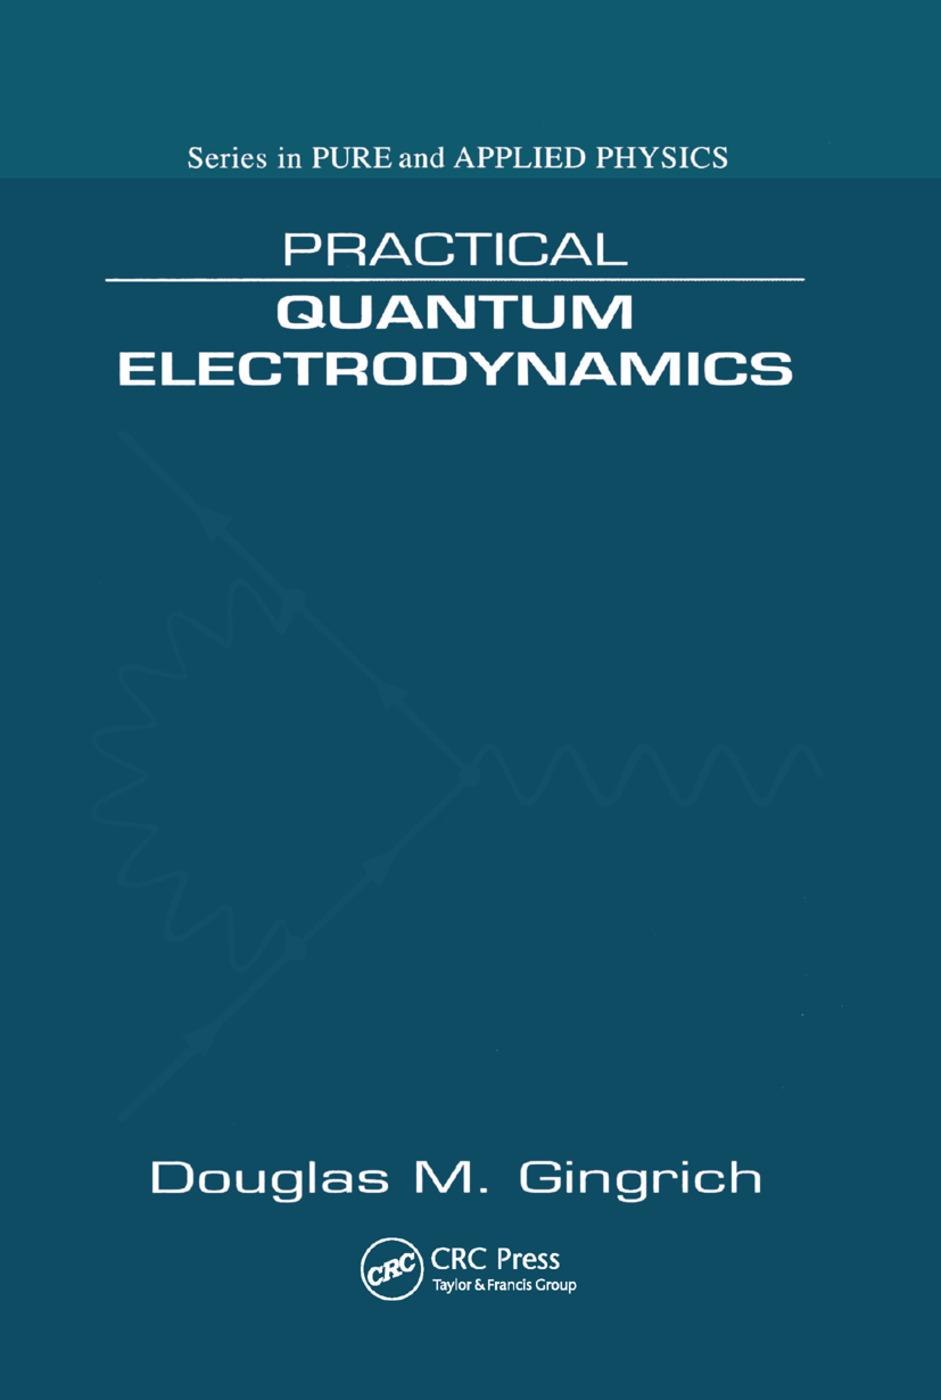 Practical Quantum Electrodynamics: 1st Edition (Paperback) book cover